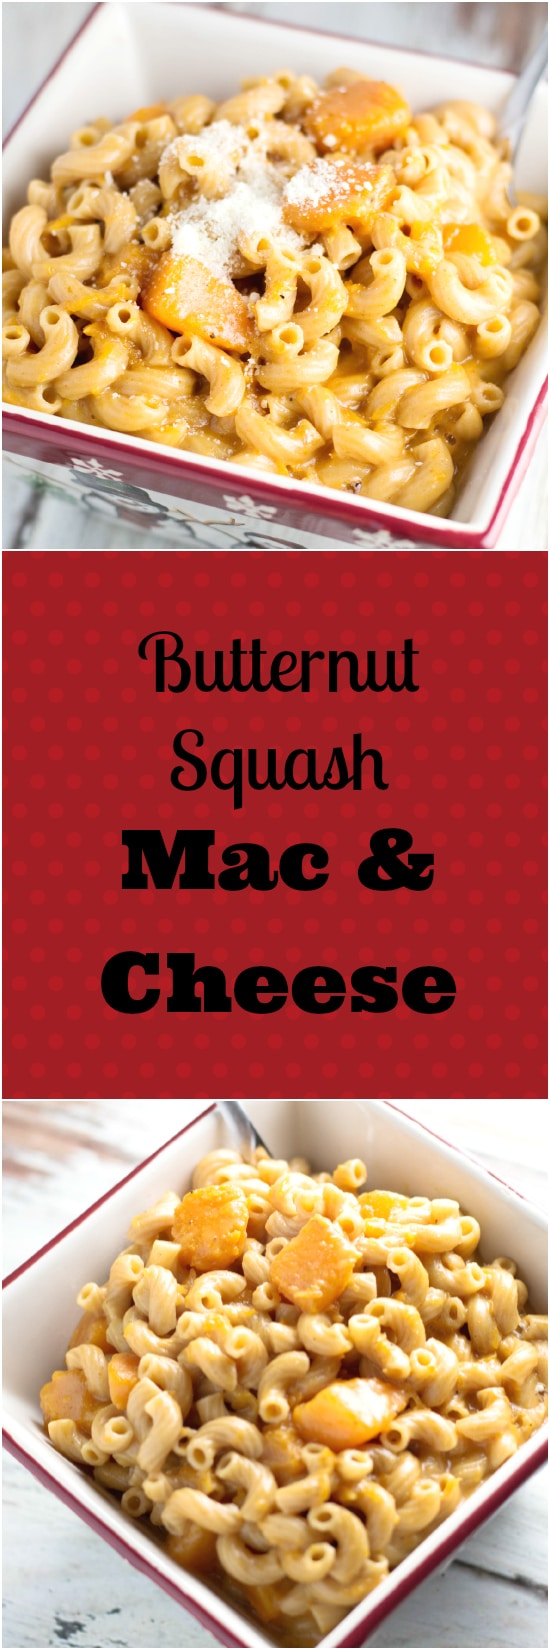 Butternut Squash Mac and Cheese. SO GOOD! Krollskorner